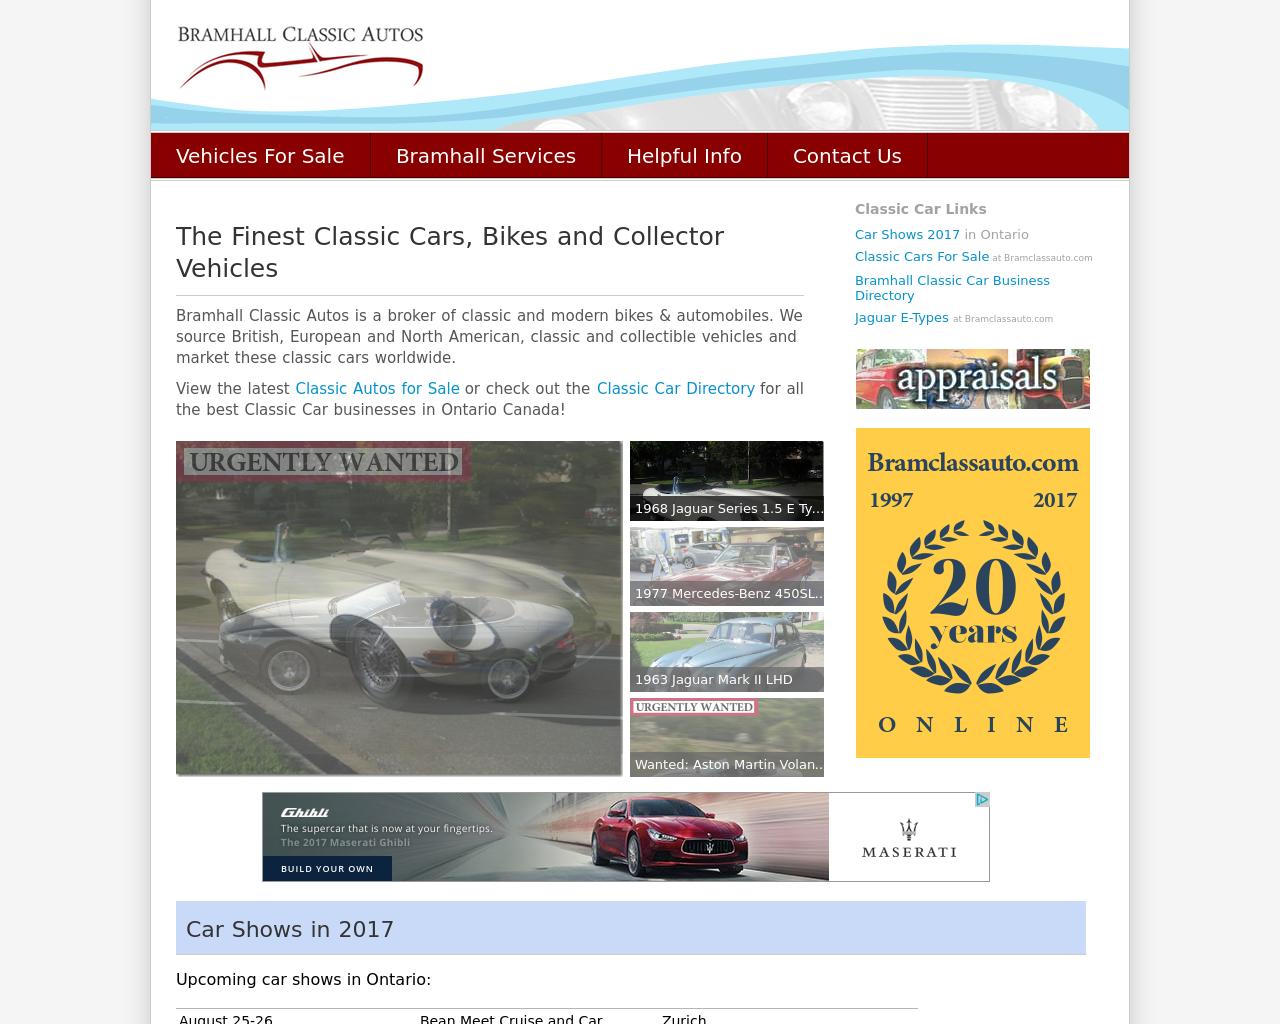 Bramhall-Classic-Autos-Advertising-Reviews-Pricing